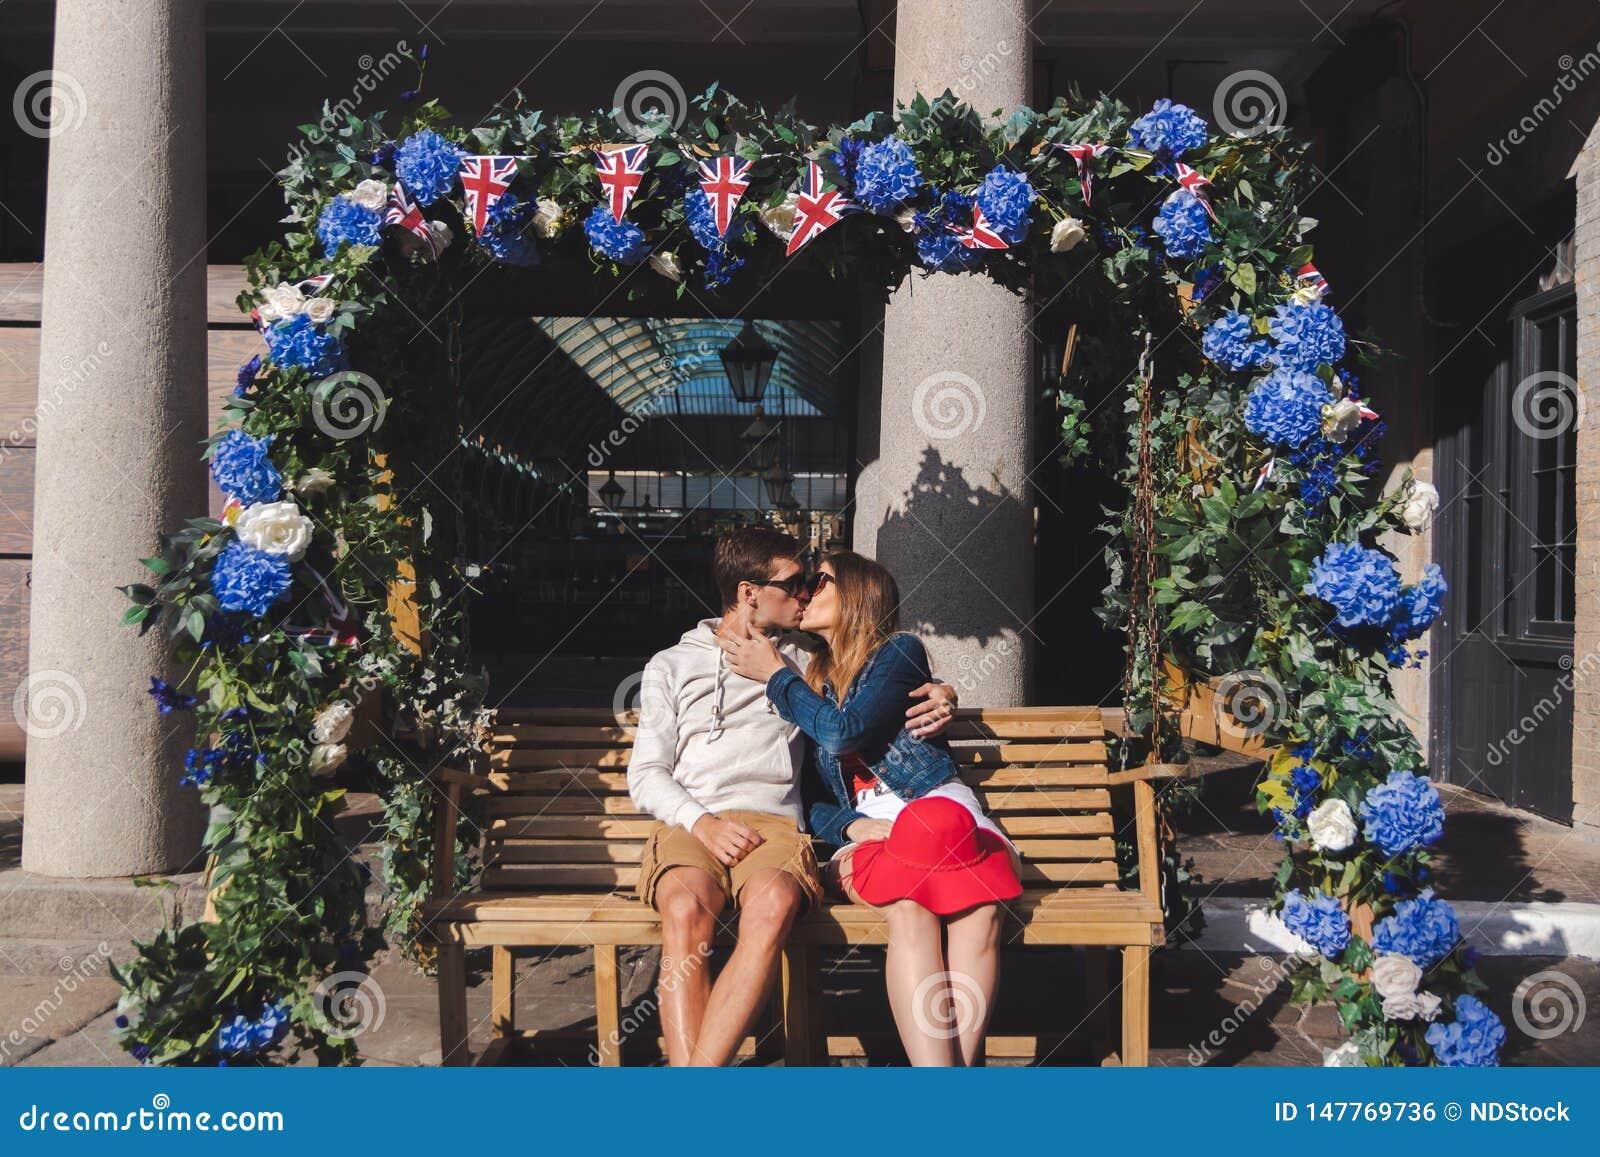 Miraculous Couple In Love Kissing Seated On A Swinging Bench In Covent Inzonedesignstudio Interior Chair Design Inzonedesignstudiocom